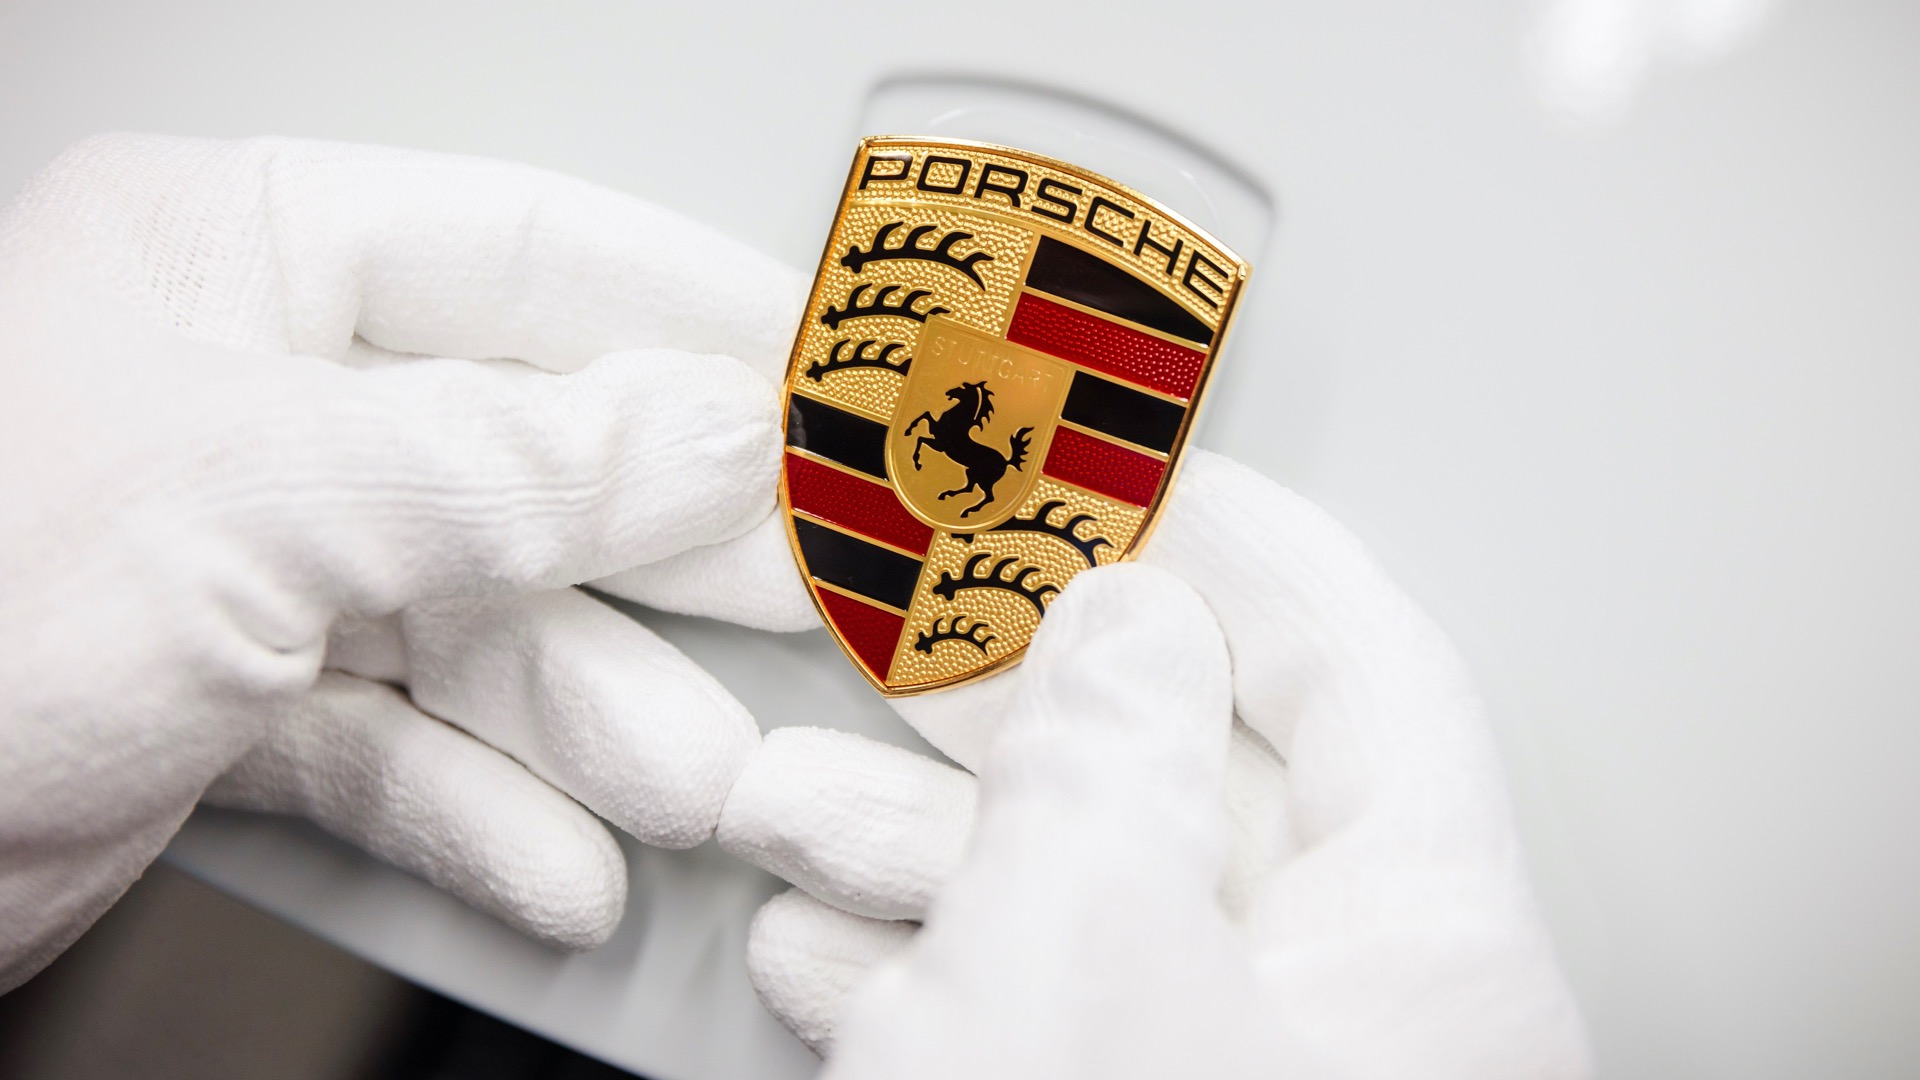 How the Porsche crest was created